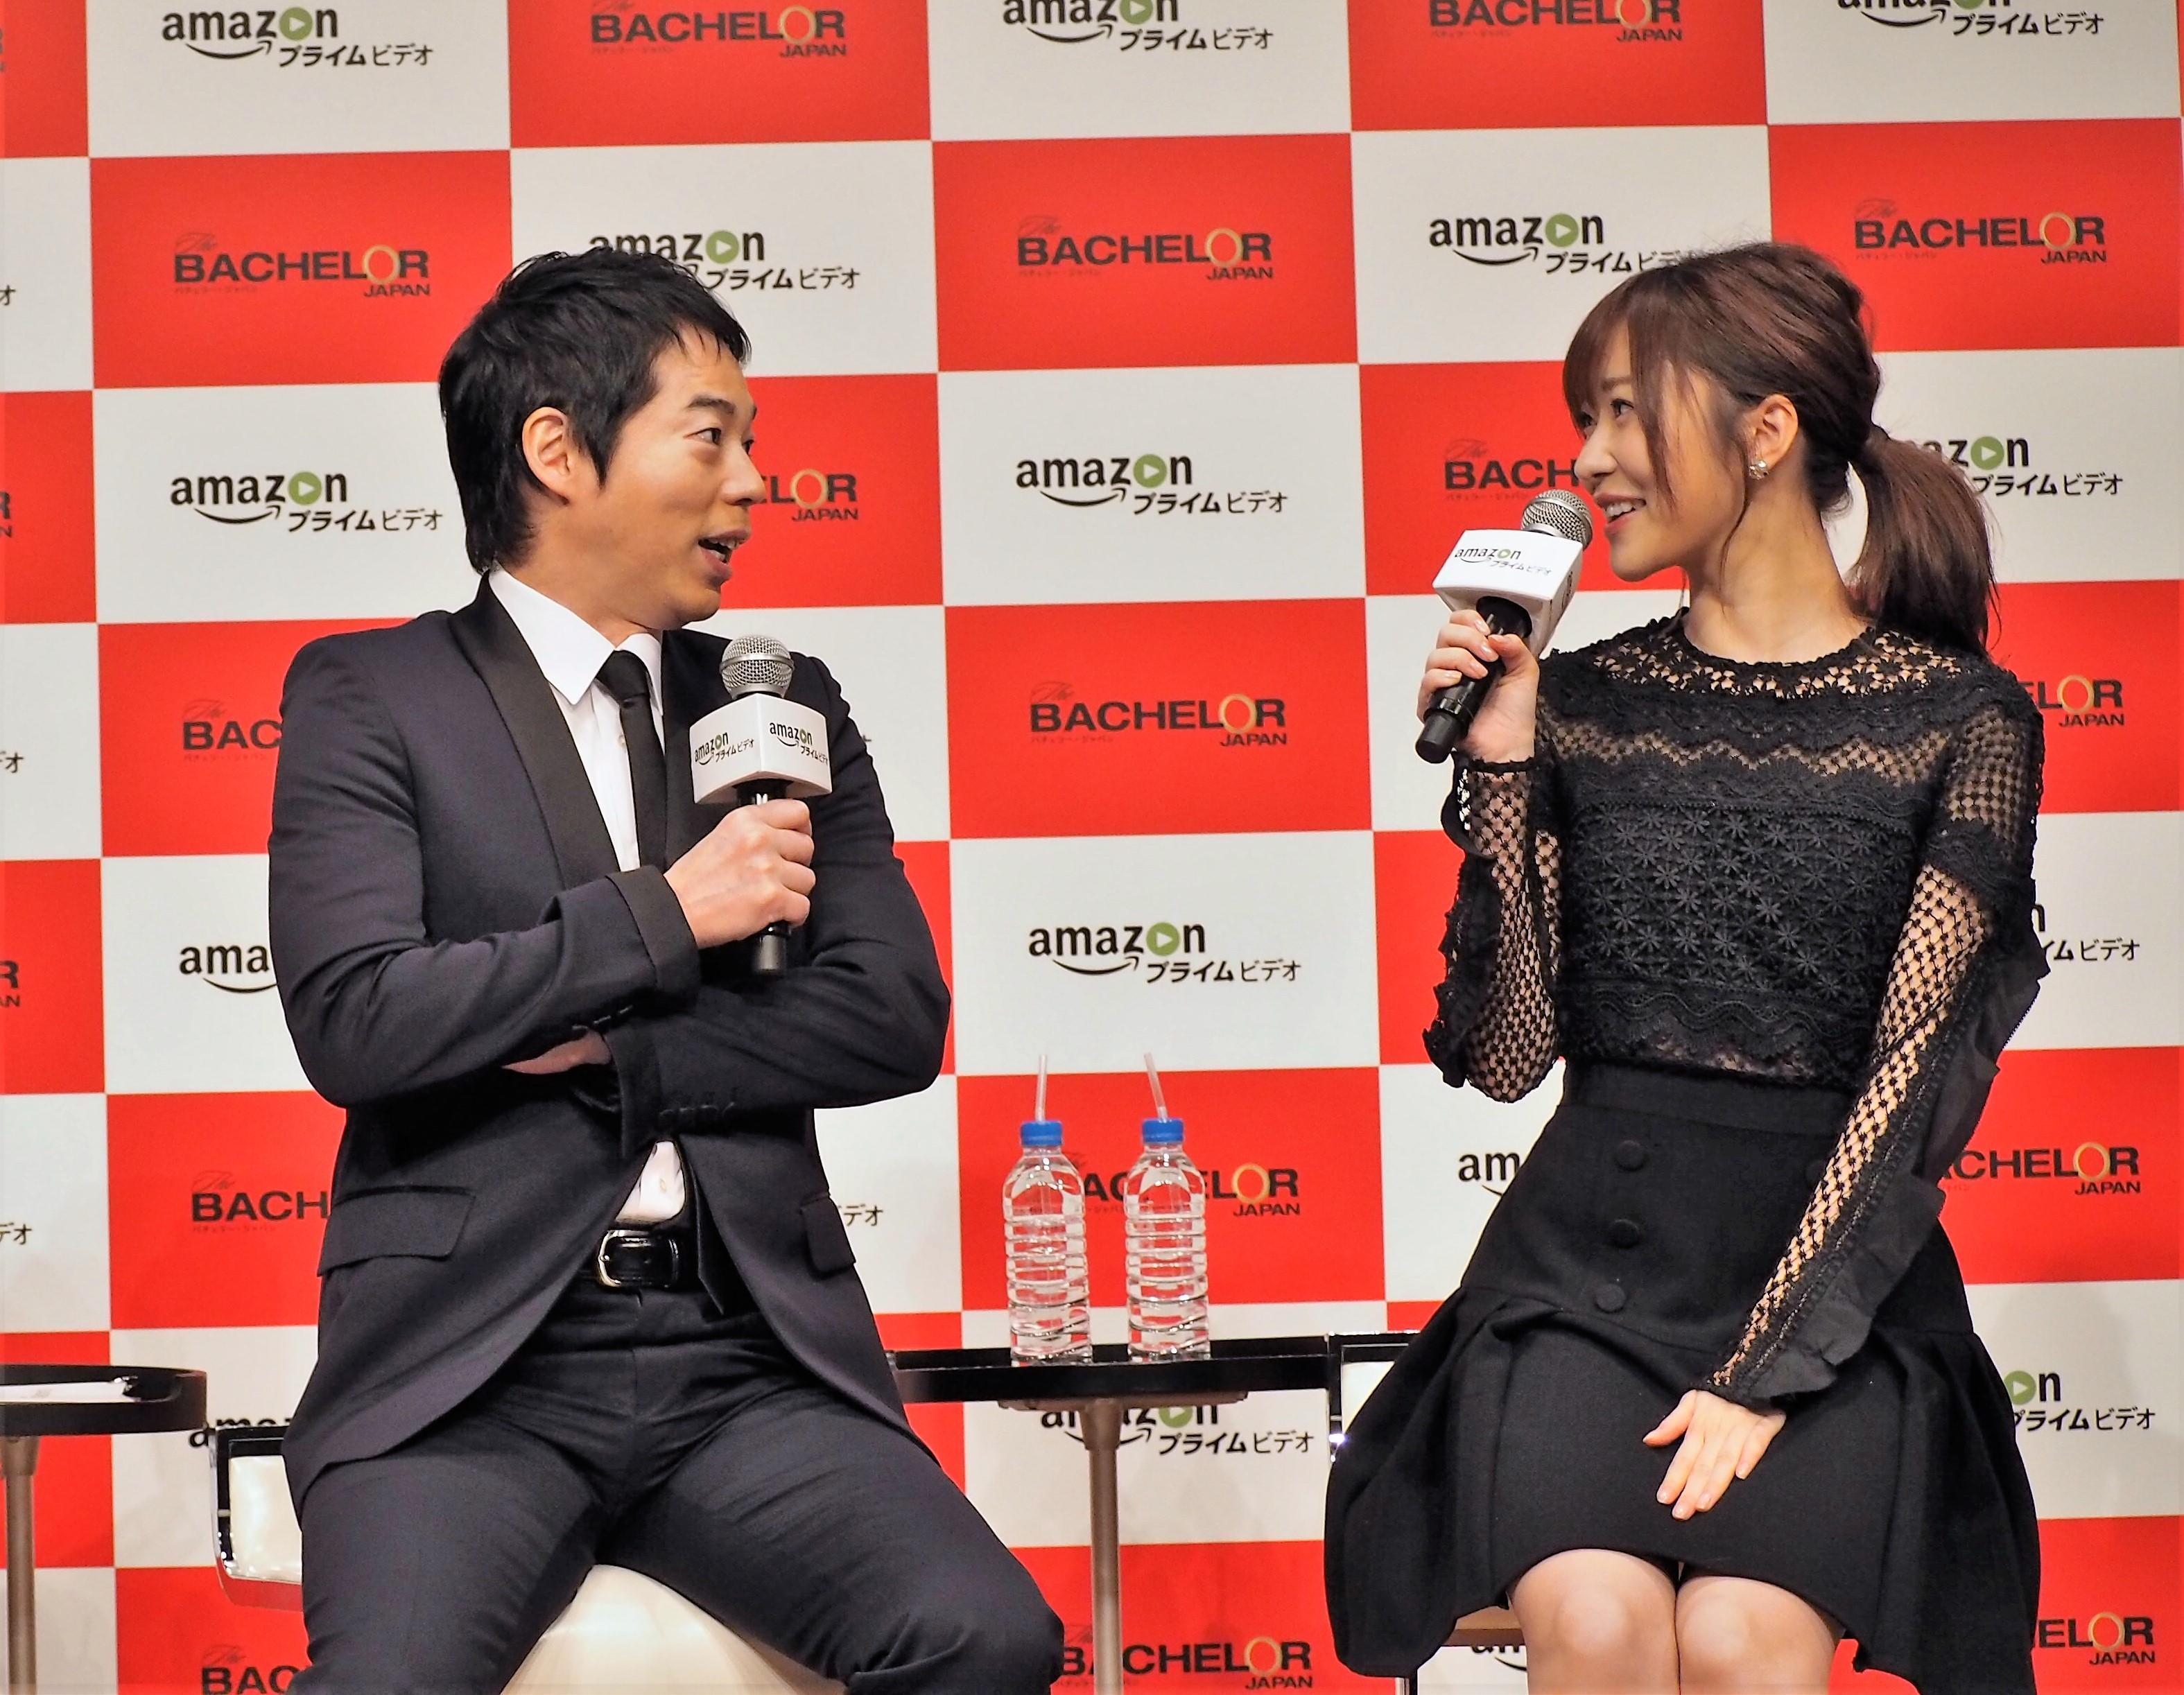 http://news.yoshimoto.co.jp/20171204164920-ece98e0a2d42941c36443b1597402ce05e893820.jpg